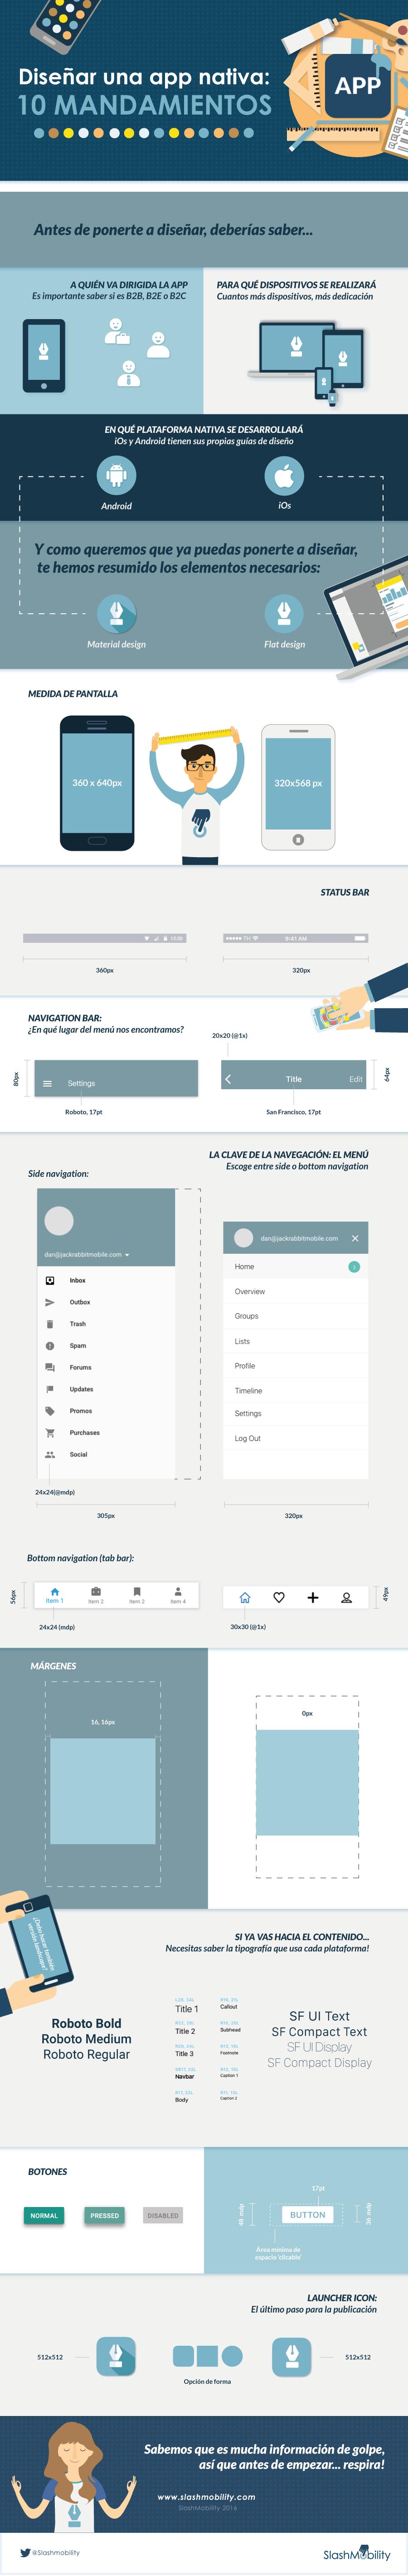 infografia-fundamentos-diseno-app-nativa